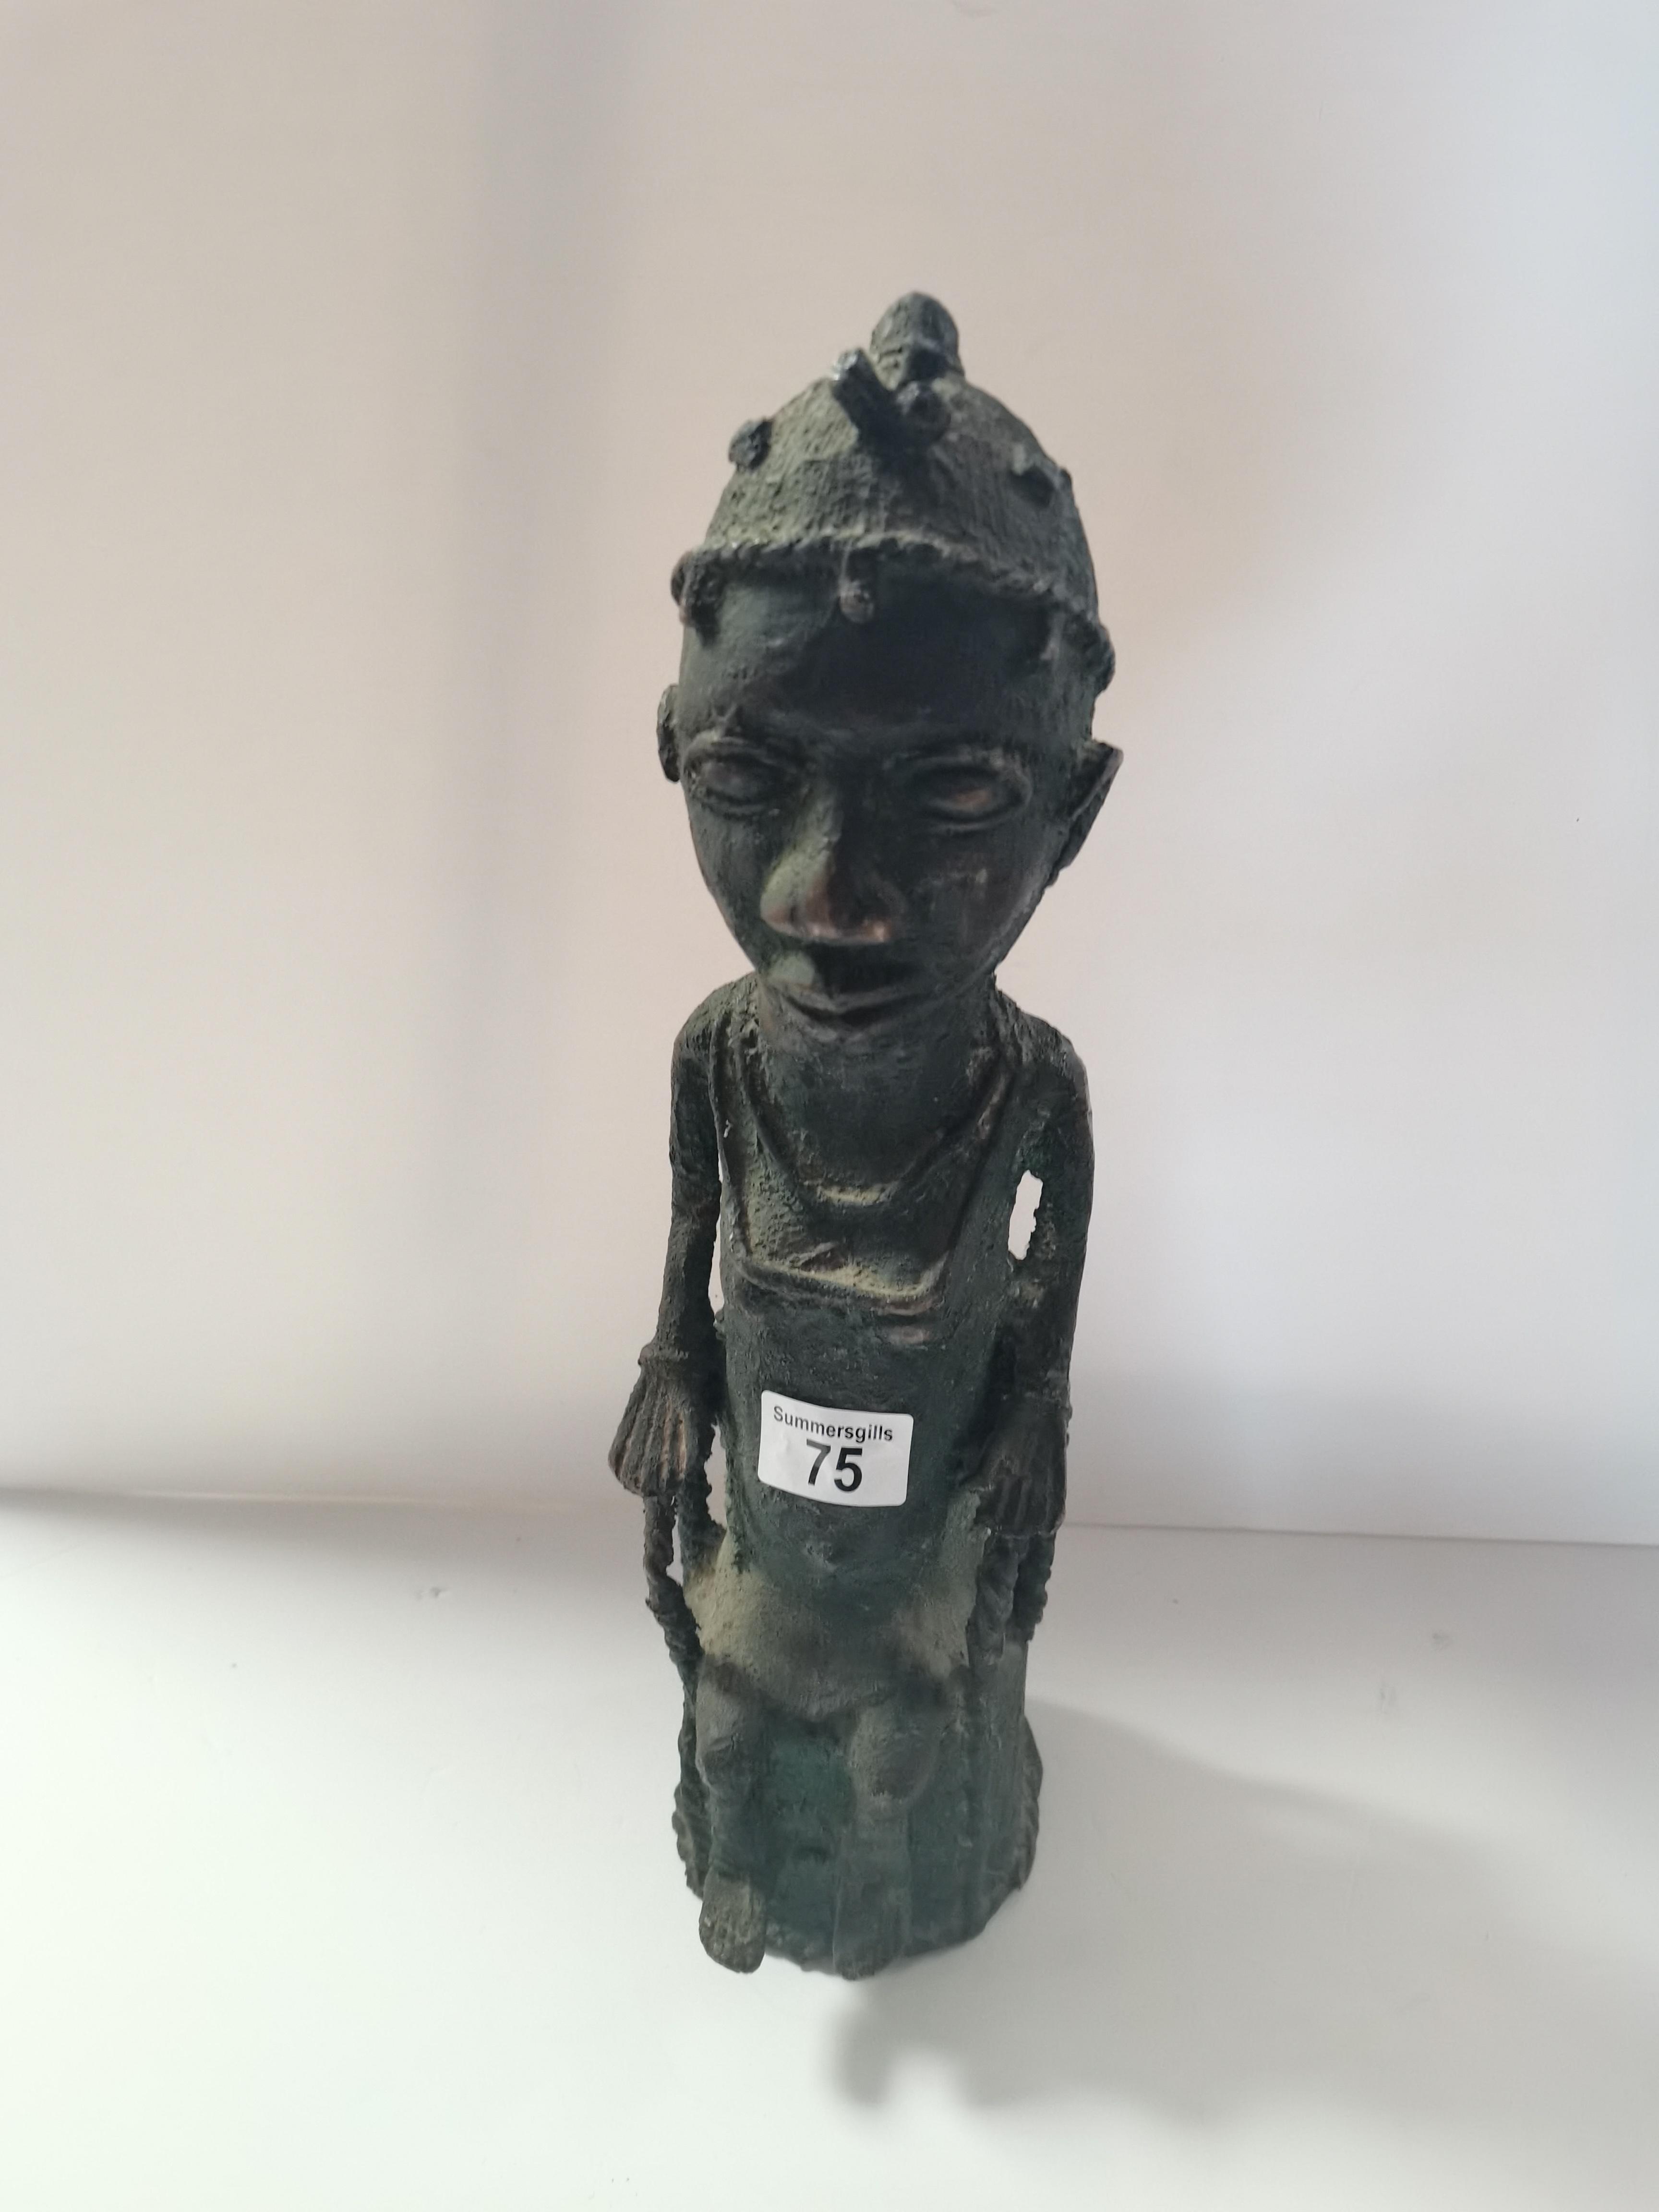 Benin bronze style figure of a seated man 43cm